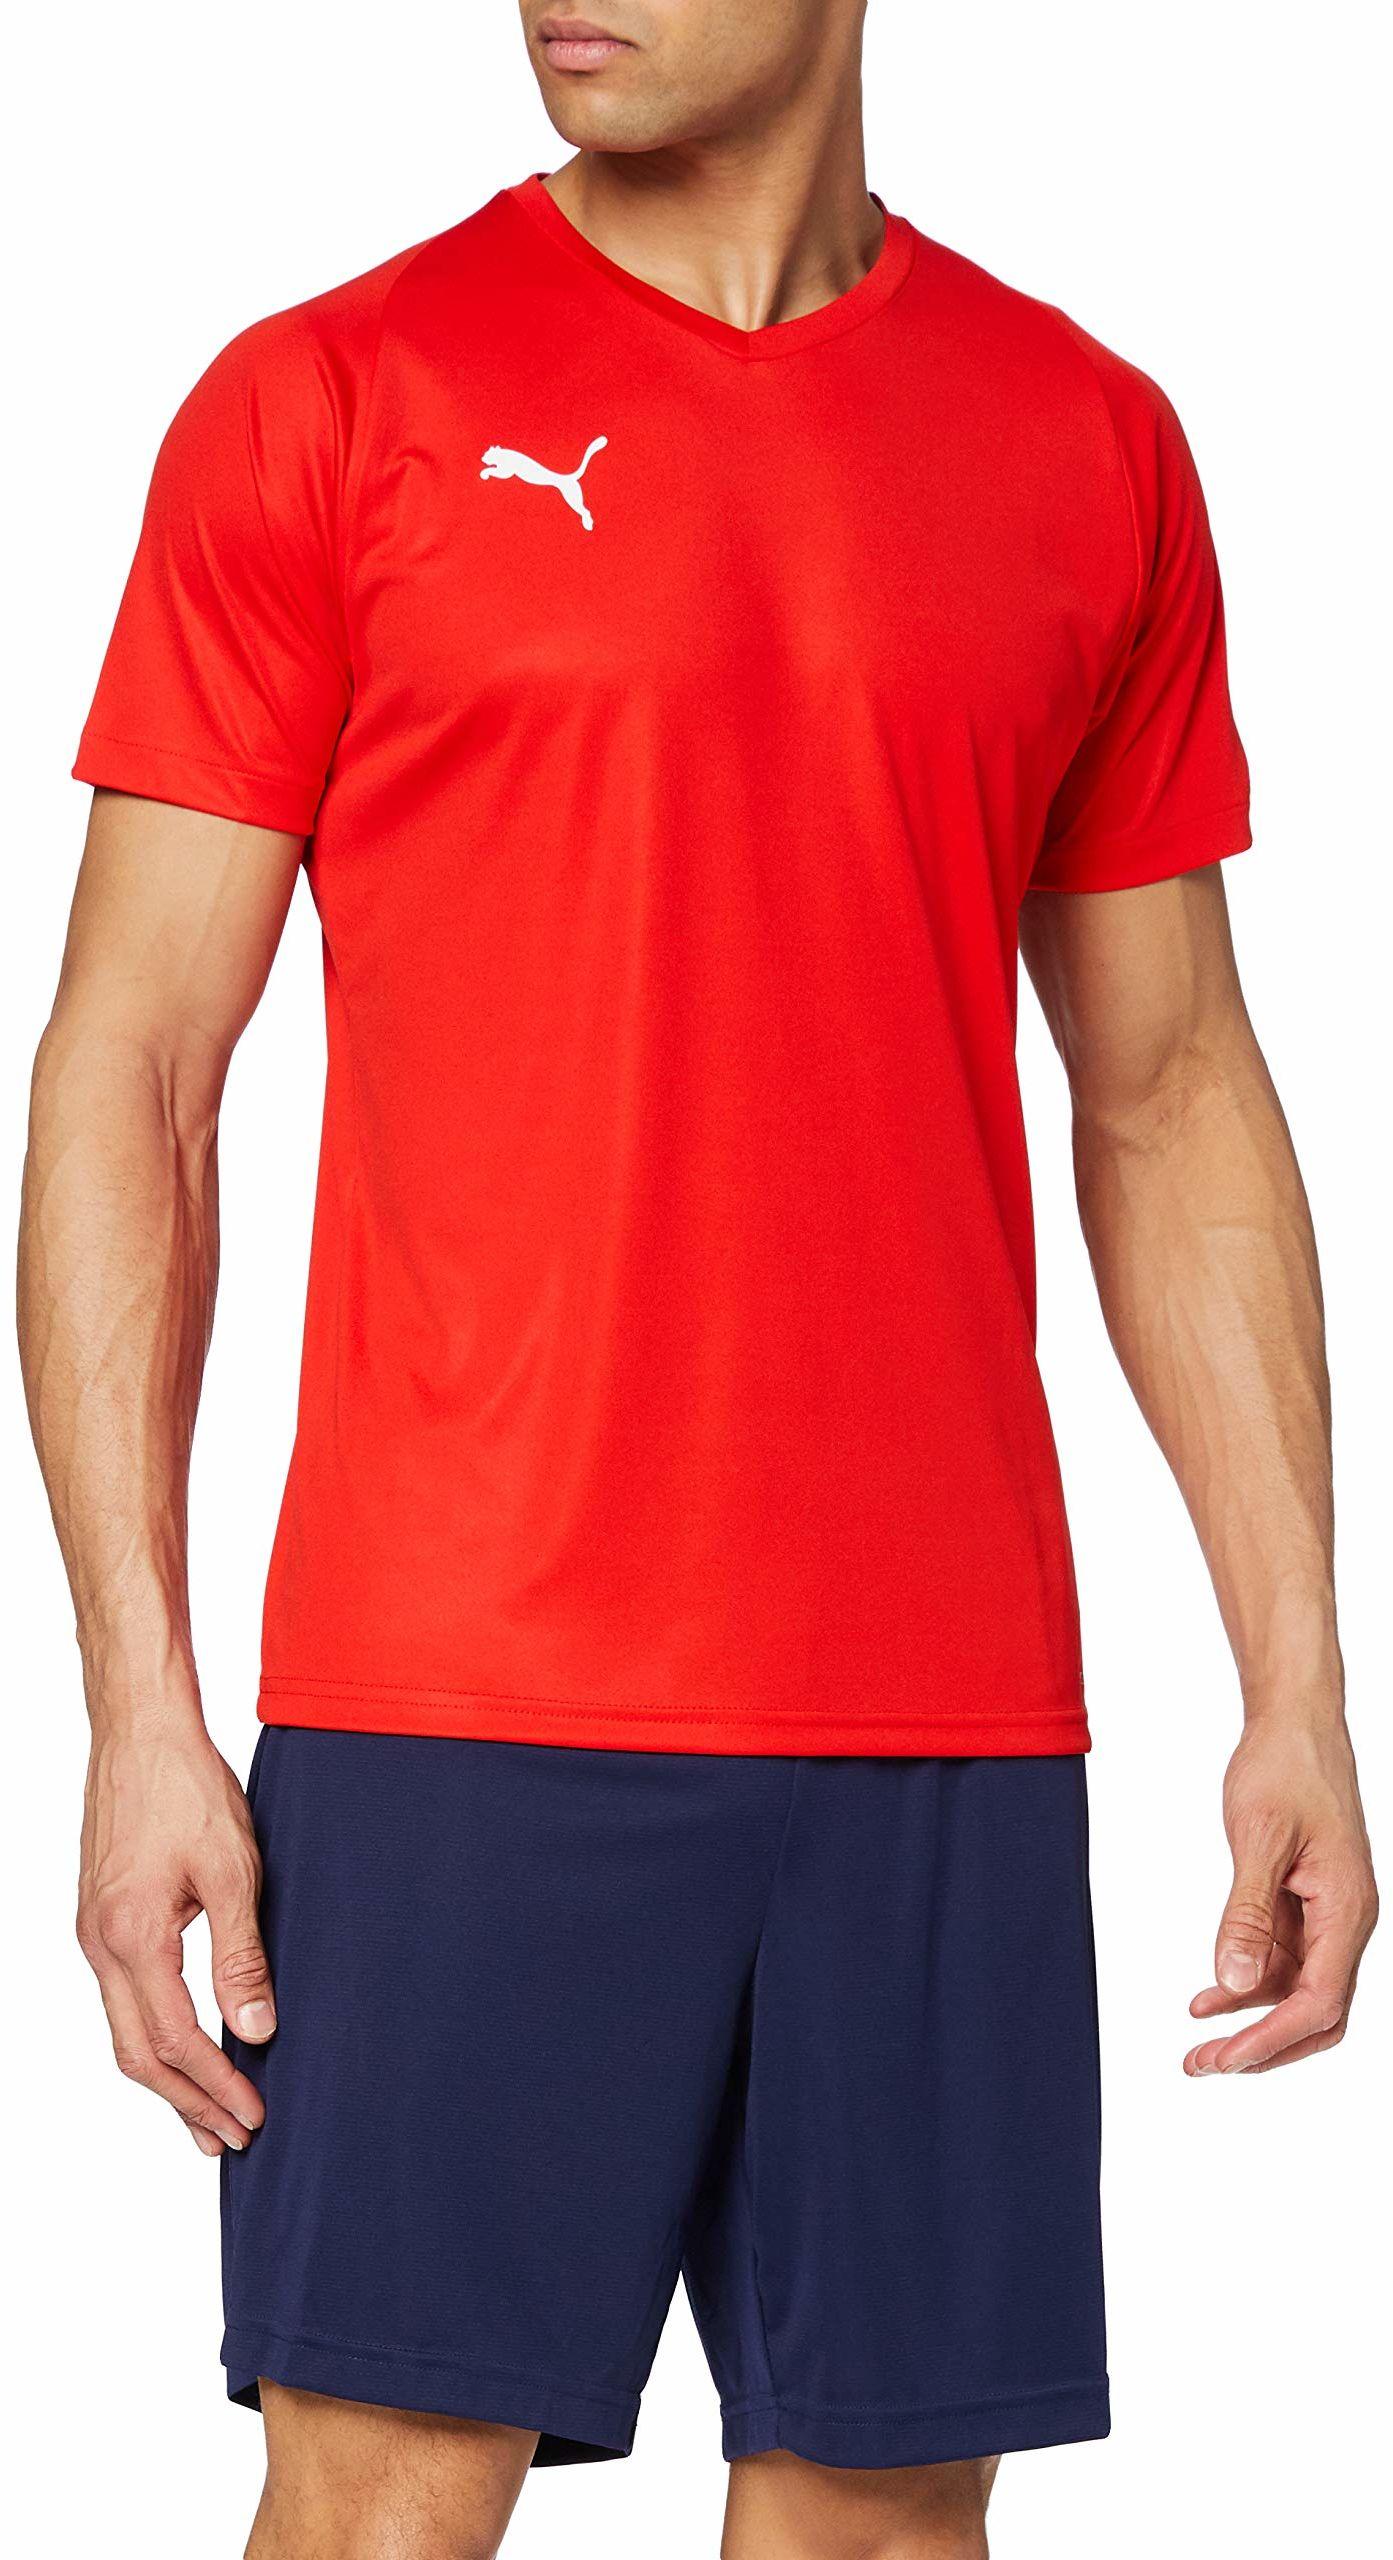 PUMA męska koszulka z dżerseju liga Puma Red/Puma White M